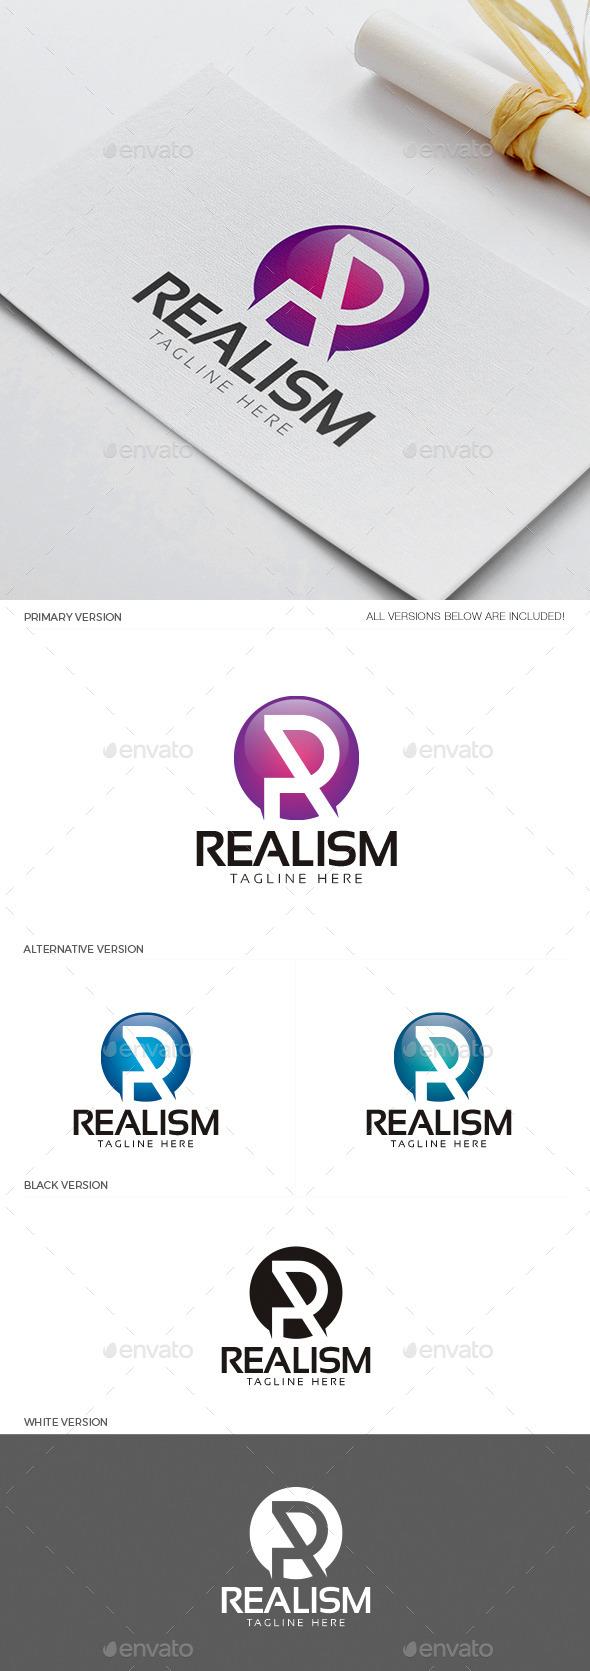 Realism - Letter R Logo - Letters Logo Templates